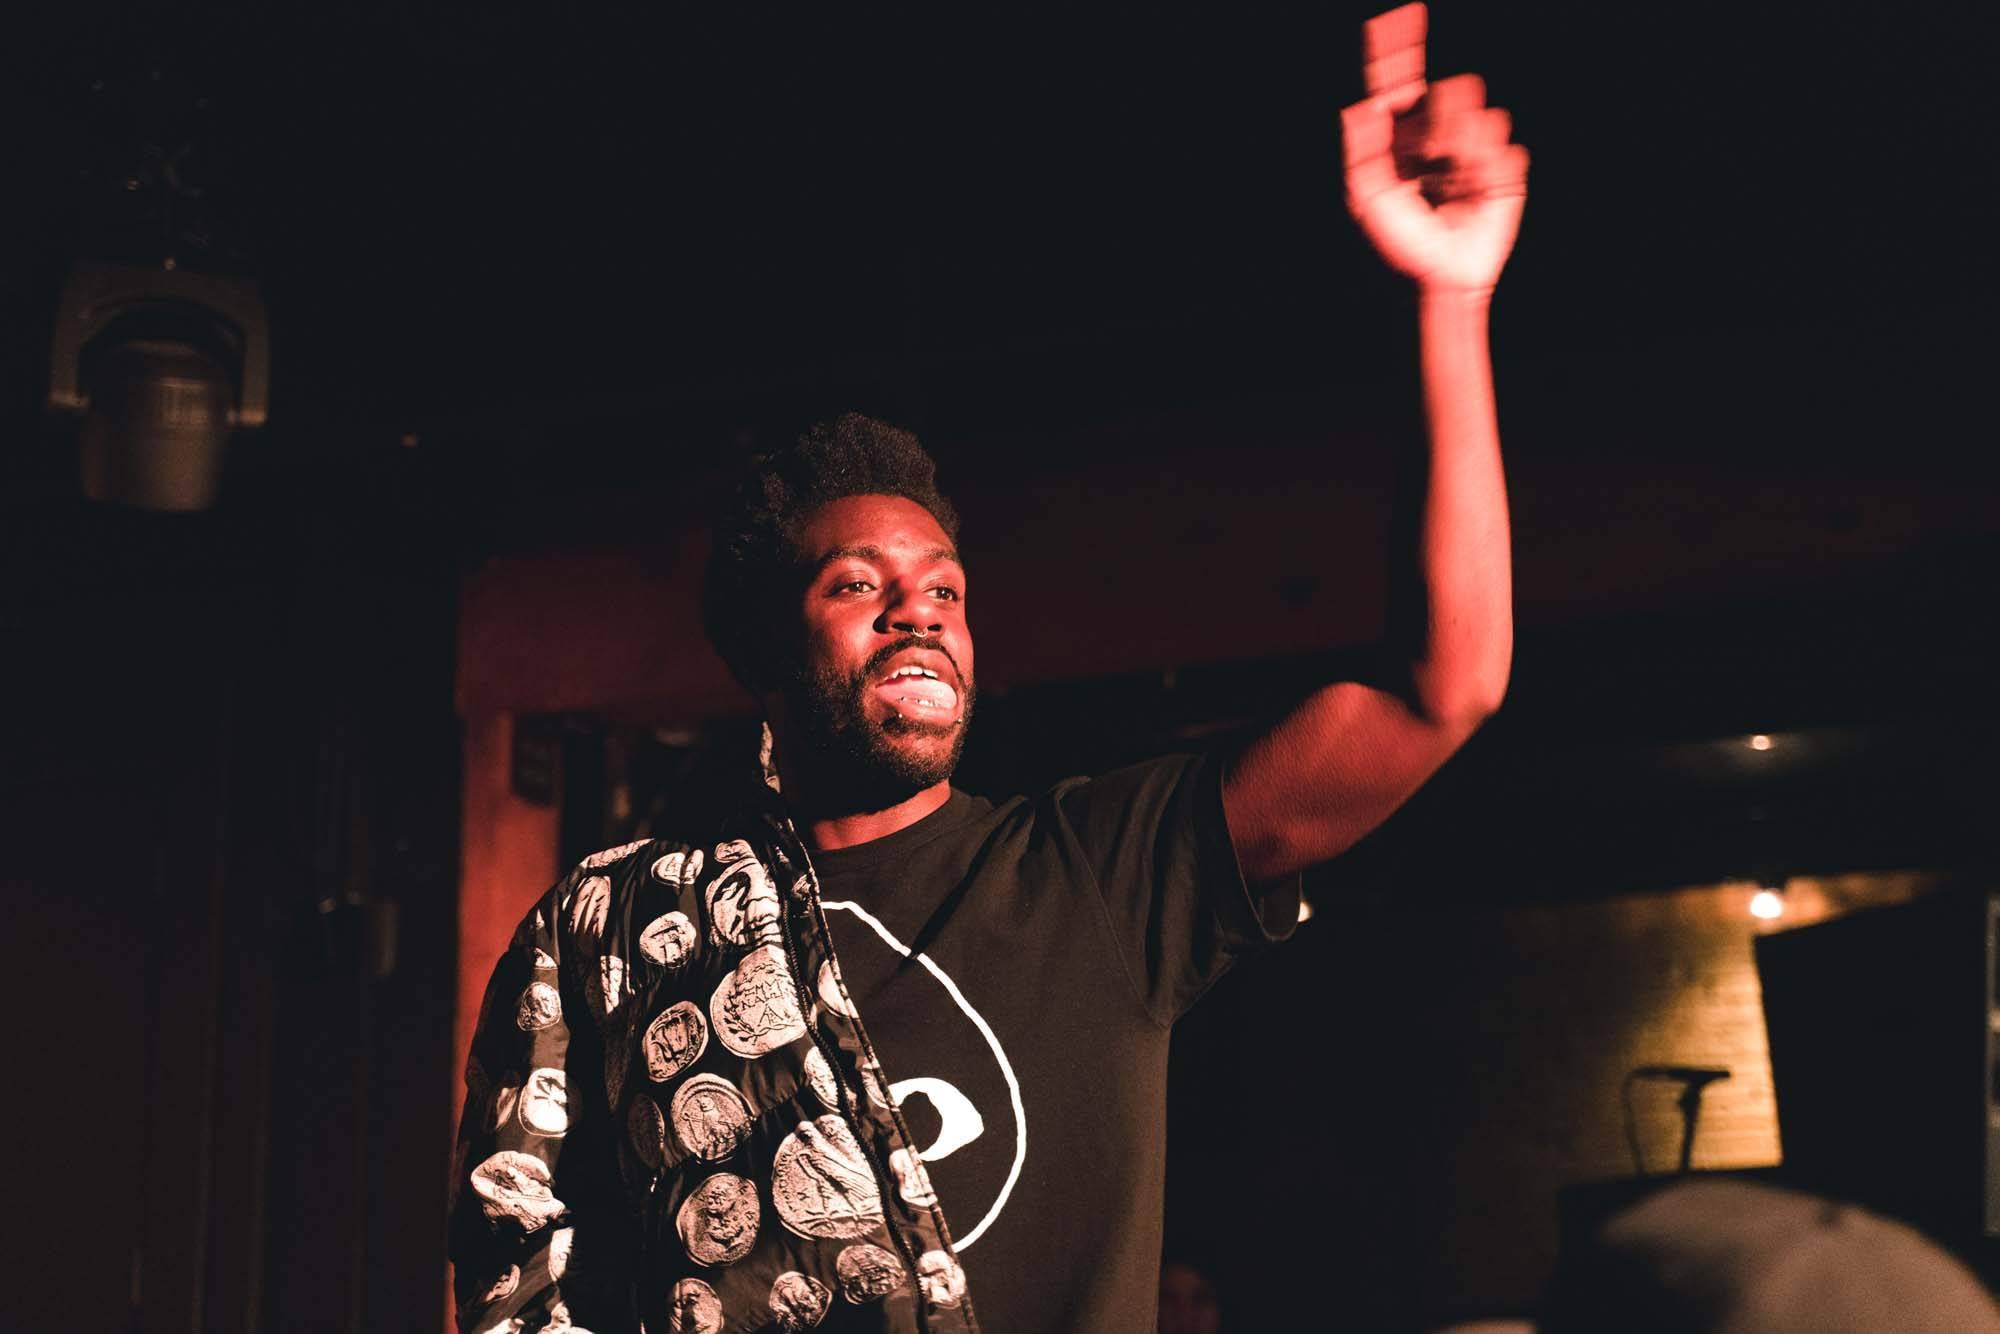 Dave at Fortune Sound Club, Vancouver, Nov 23 2019. Noah Shumka photo.